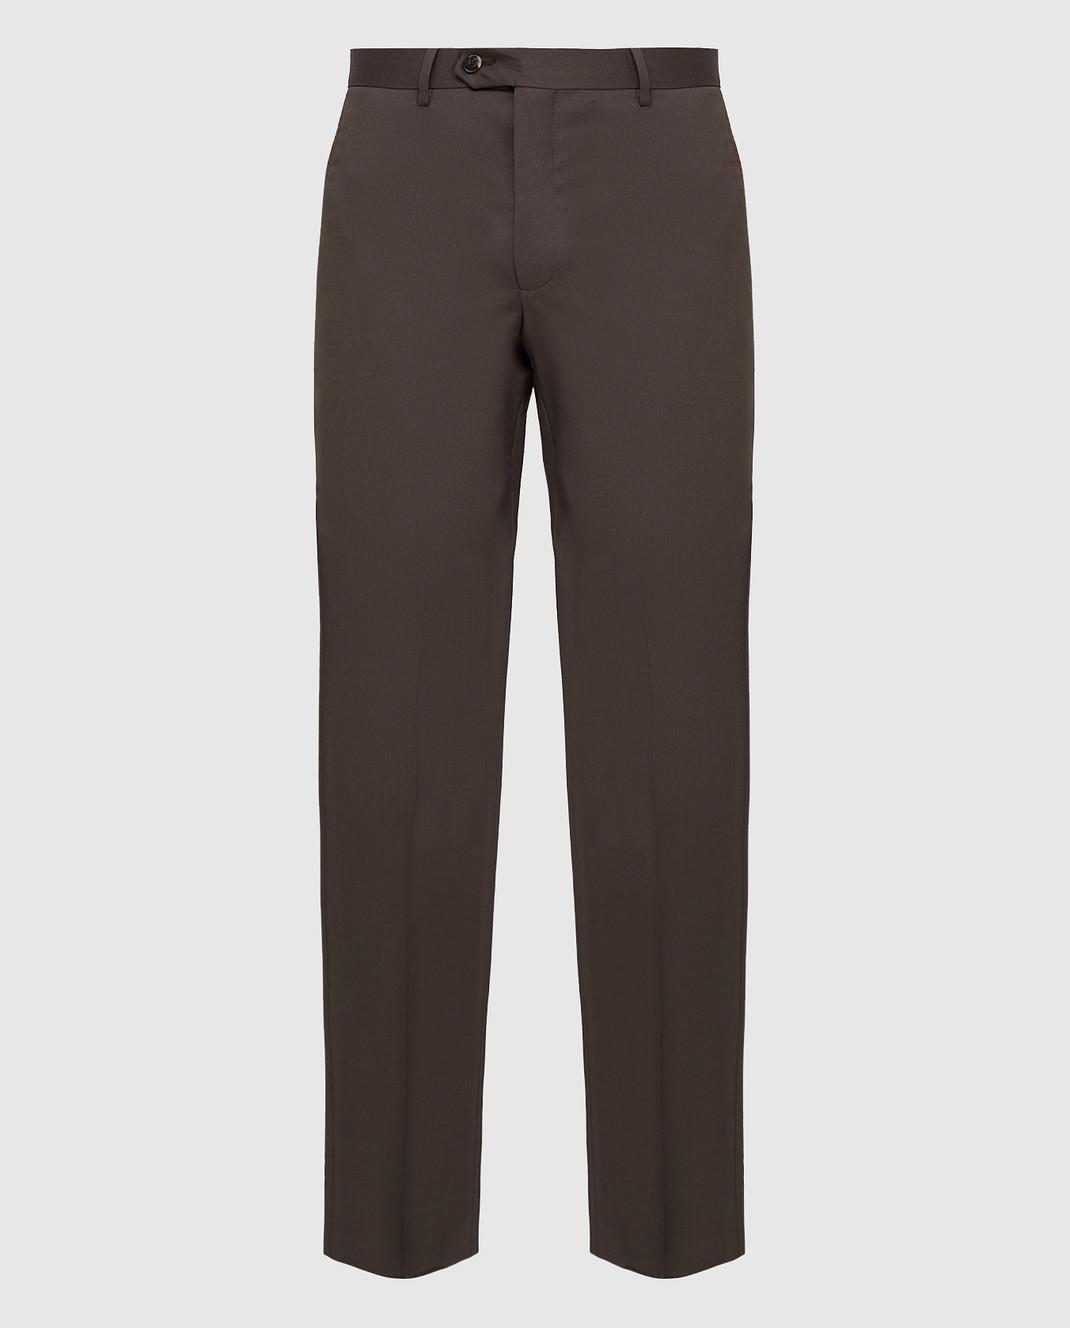 Castello d'Oro Темно-коричневые брюки из шерсти изображение 1